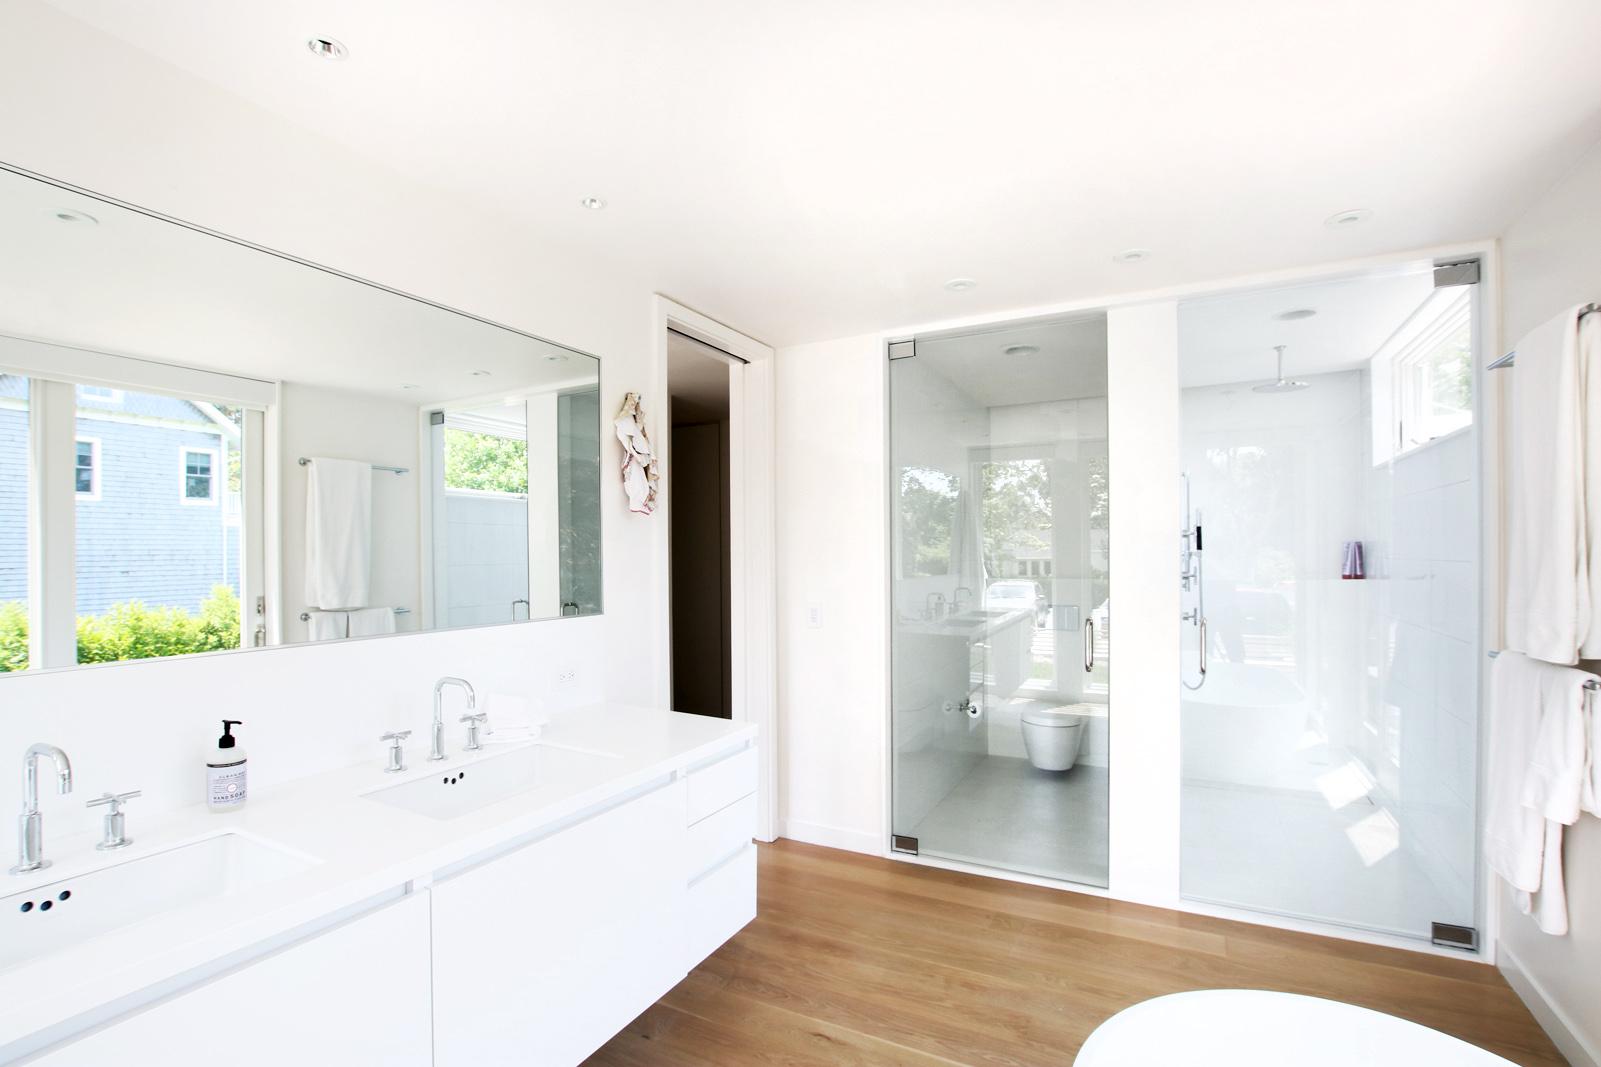 16-re4a-resolution-4-architecture-modern-modular-prefab-bridgehampton house-interior-master-bath-room.jpg